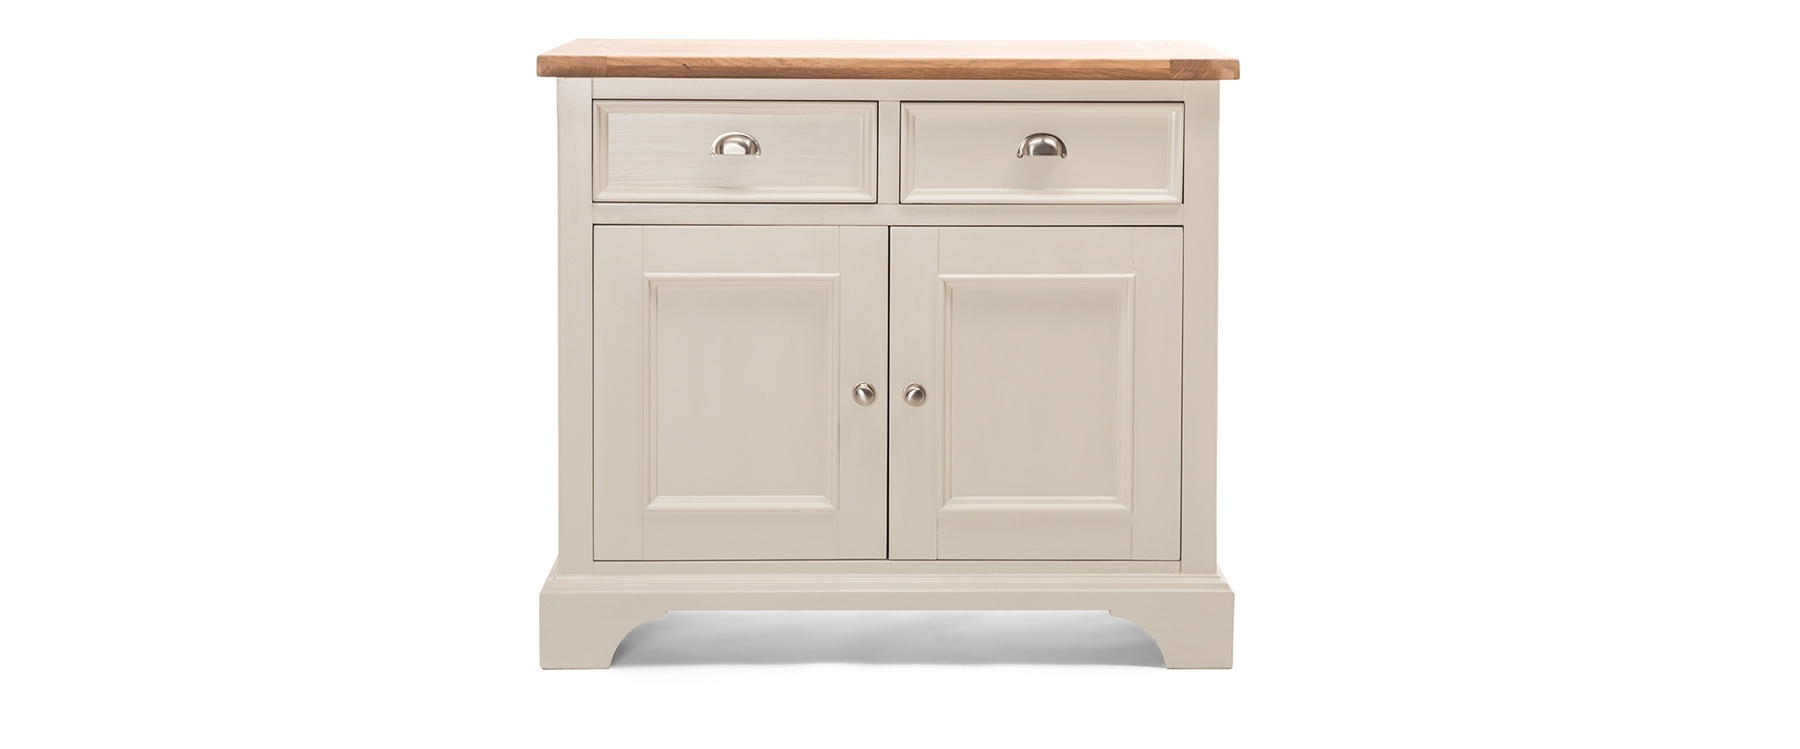 Cornwall Buffet 2 Doors & 2 Drawers | Ez Living Furniture Northern in White Wash 3-Door 3-Drawer Sideboards (Image 6 of 30)